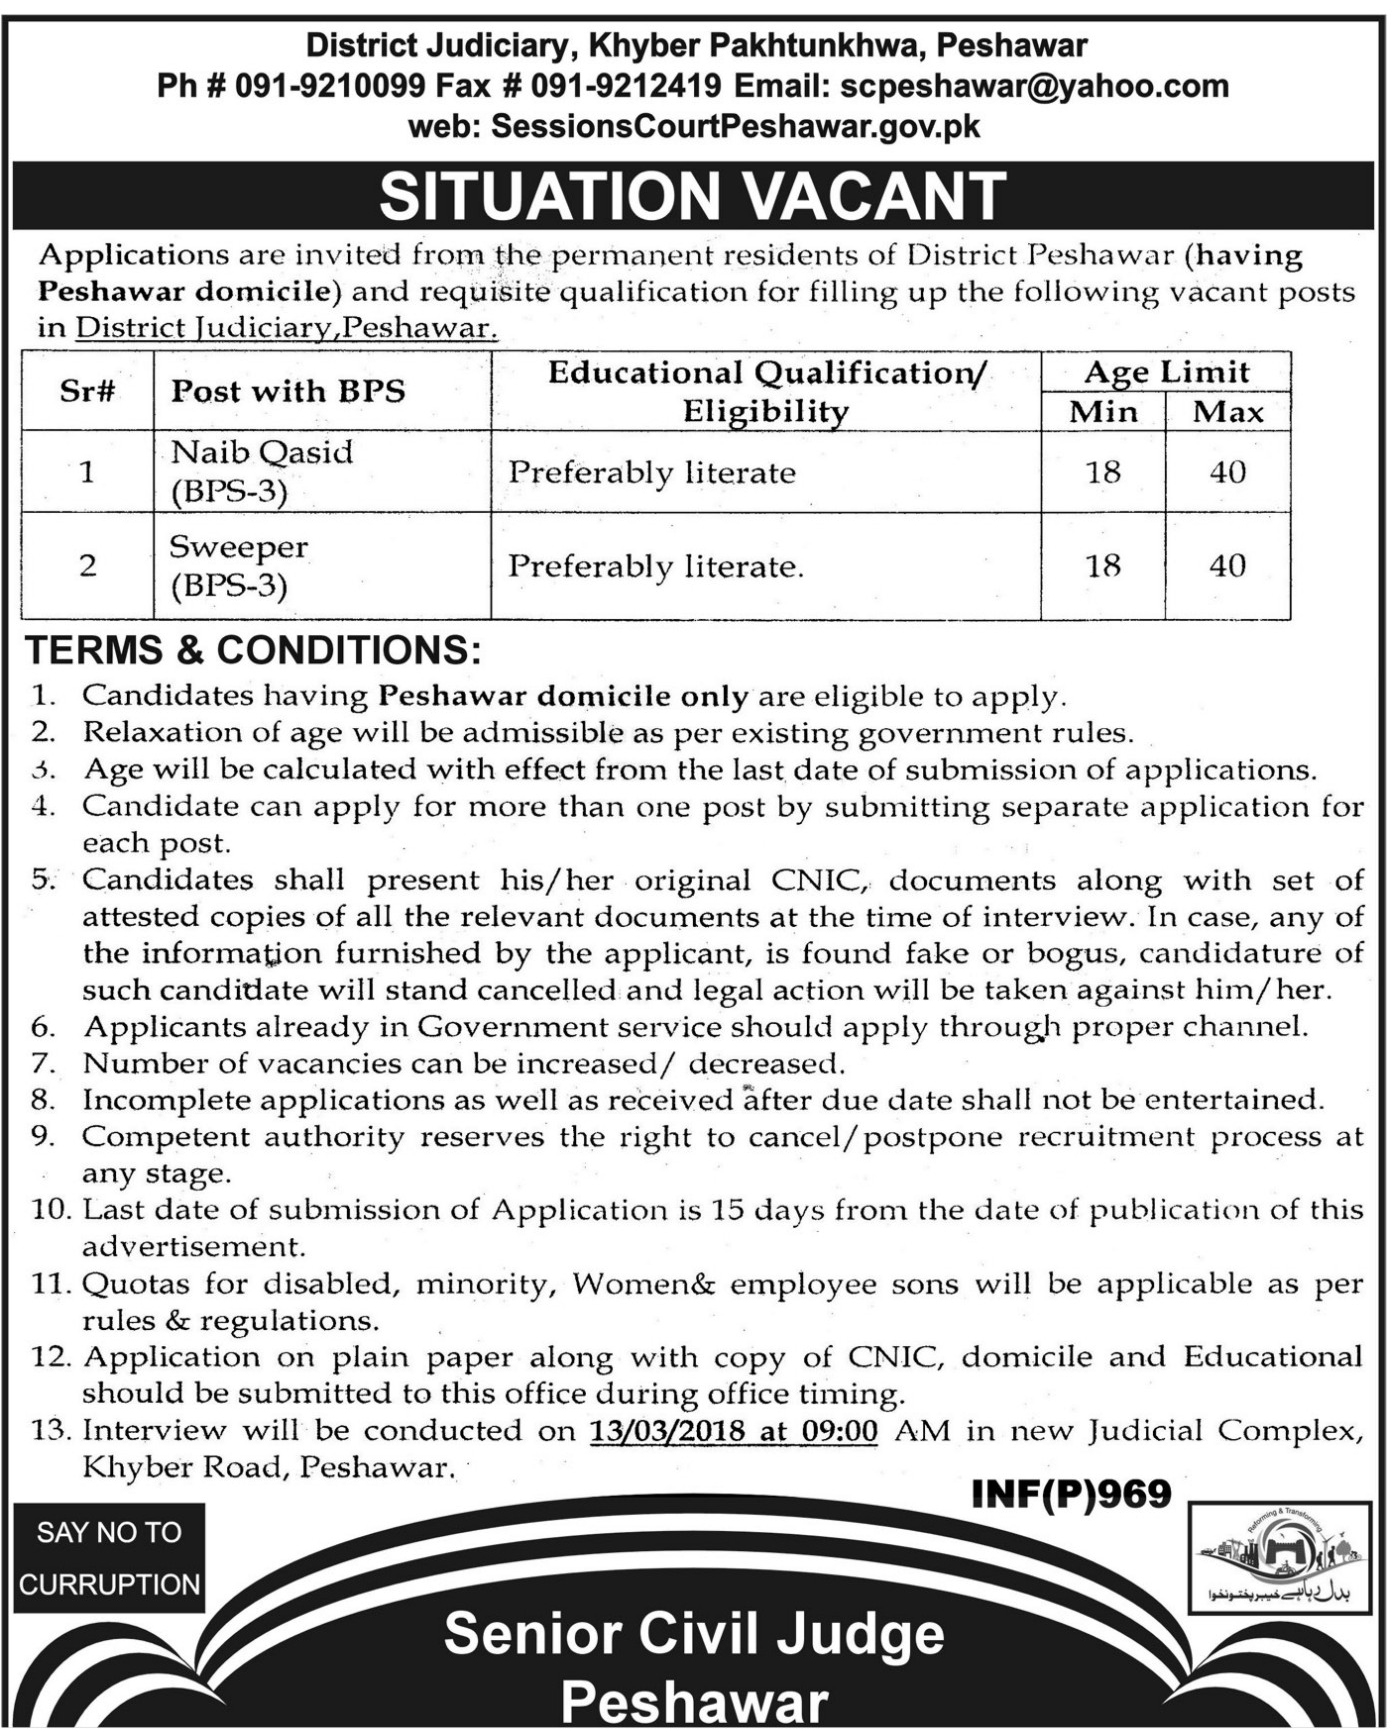 District Judiciary Kpk Peshawar Naib Qasid Jobs 2019 Job